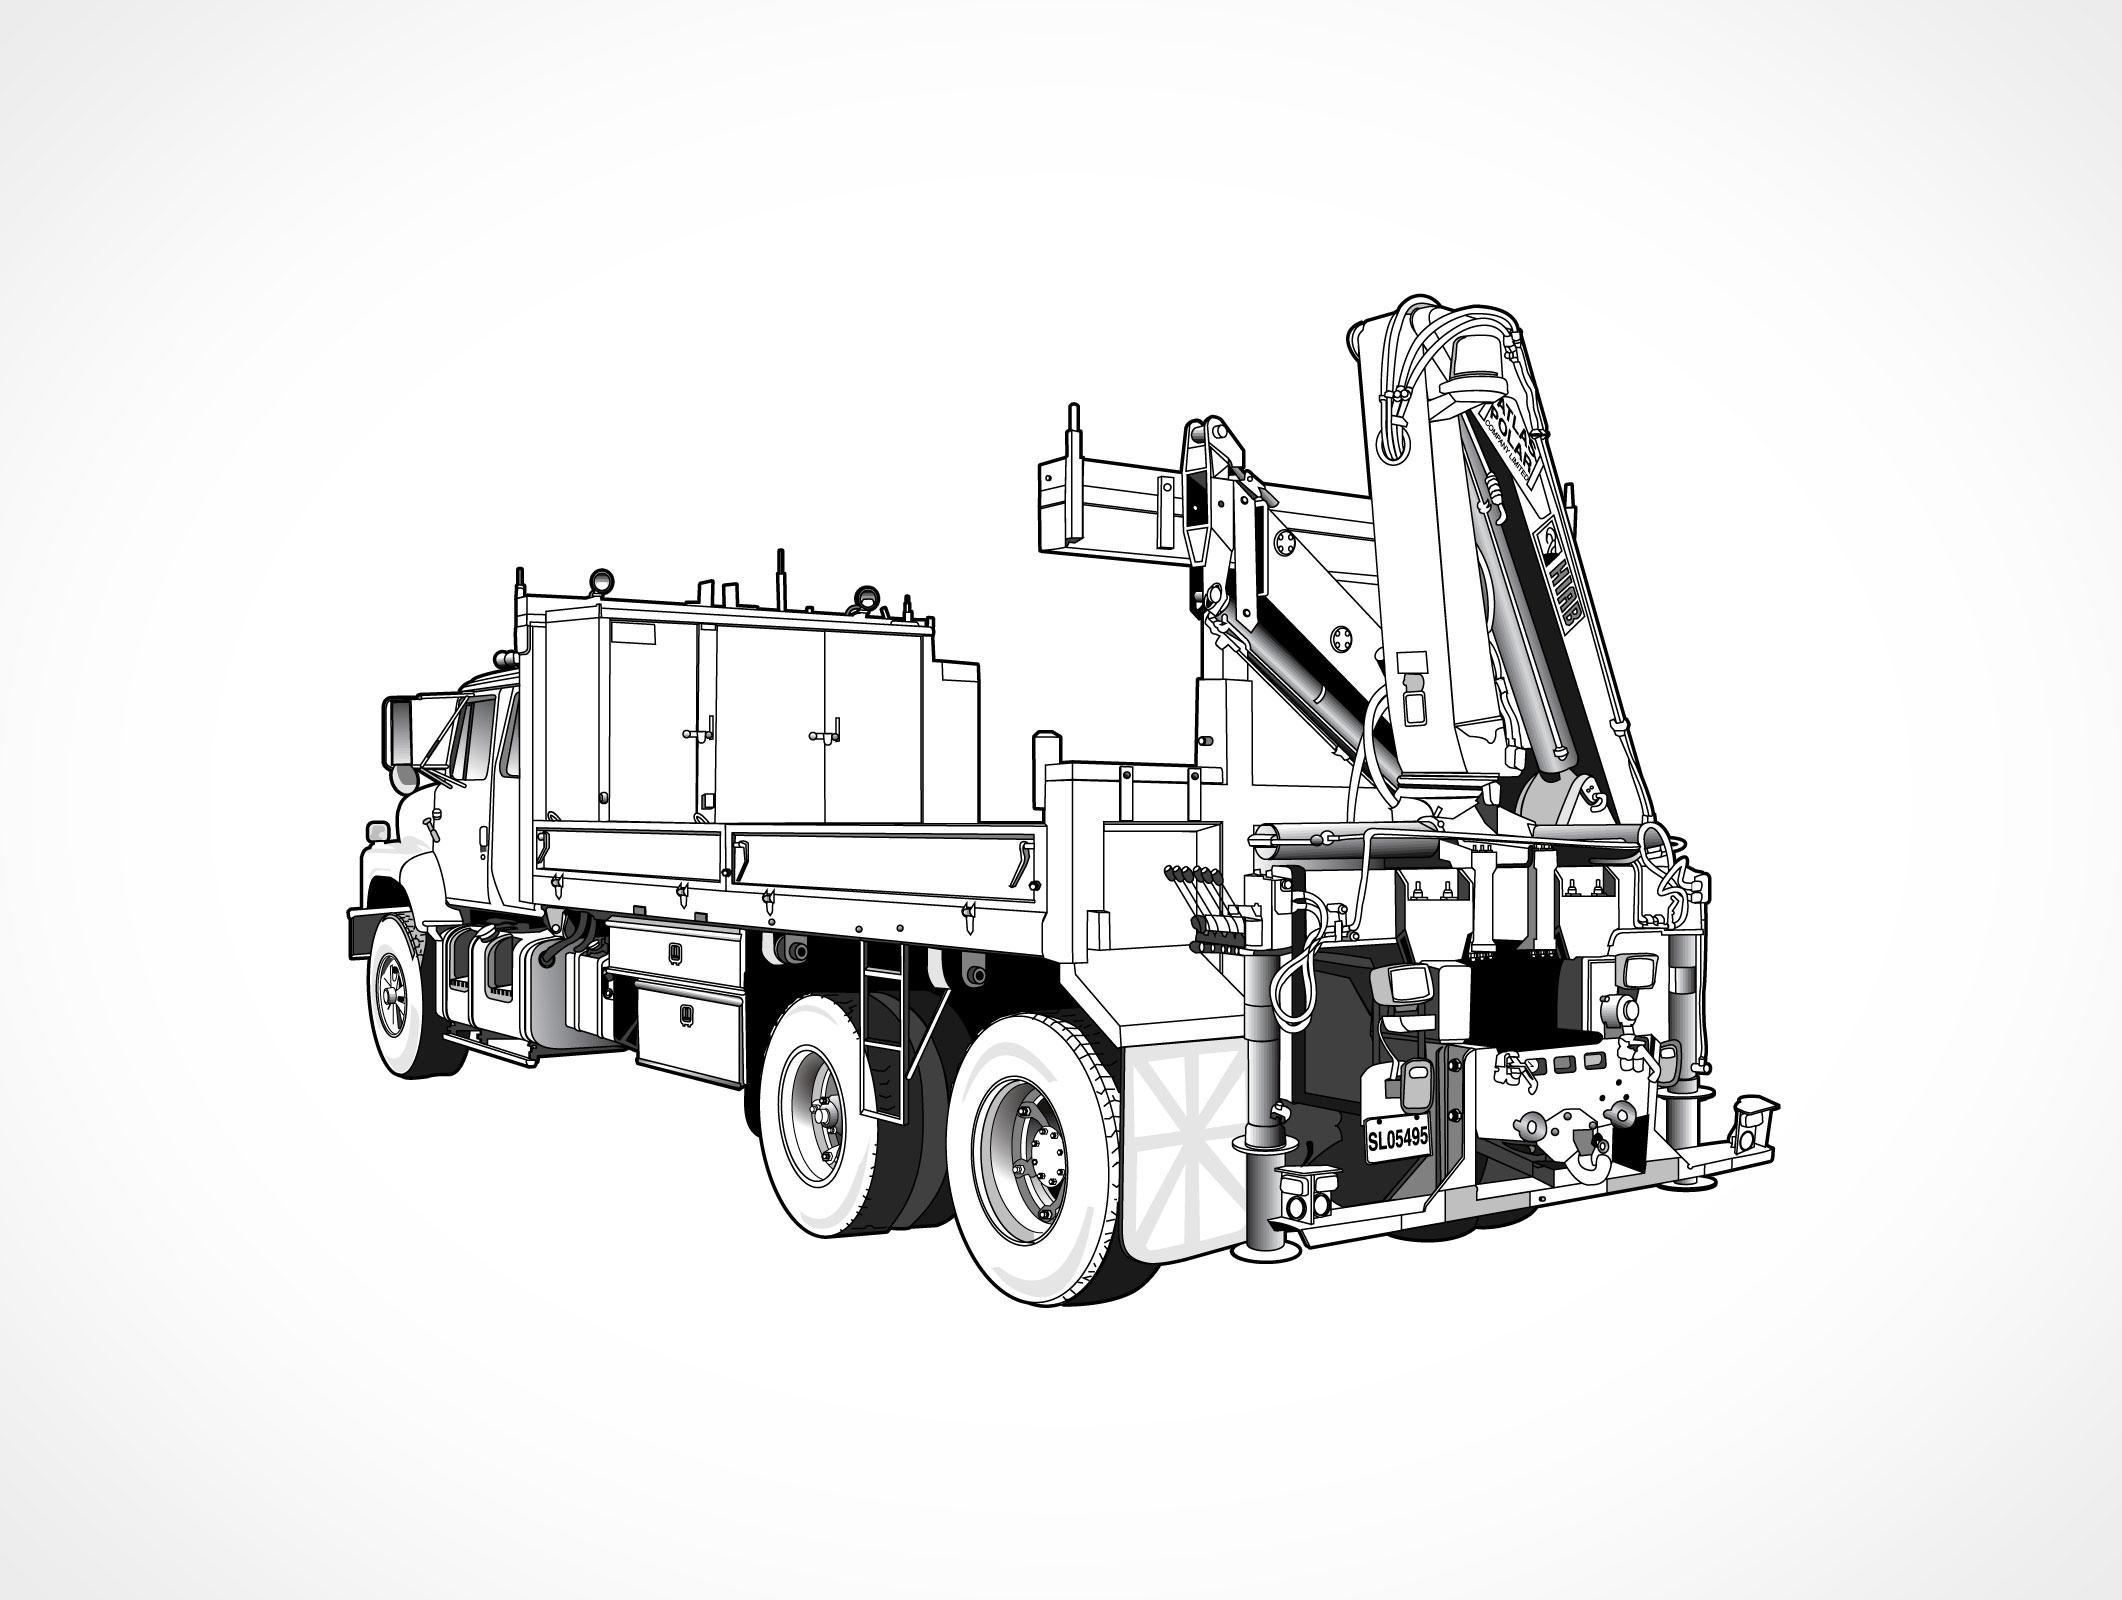 Hoist Lift Truck